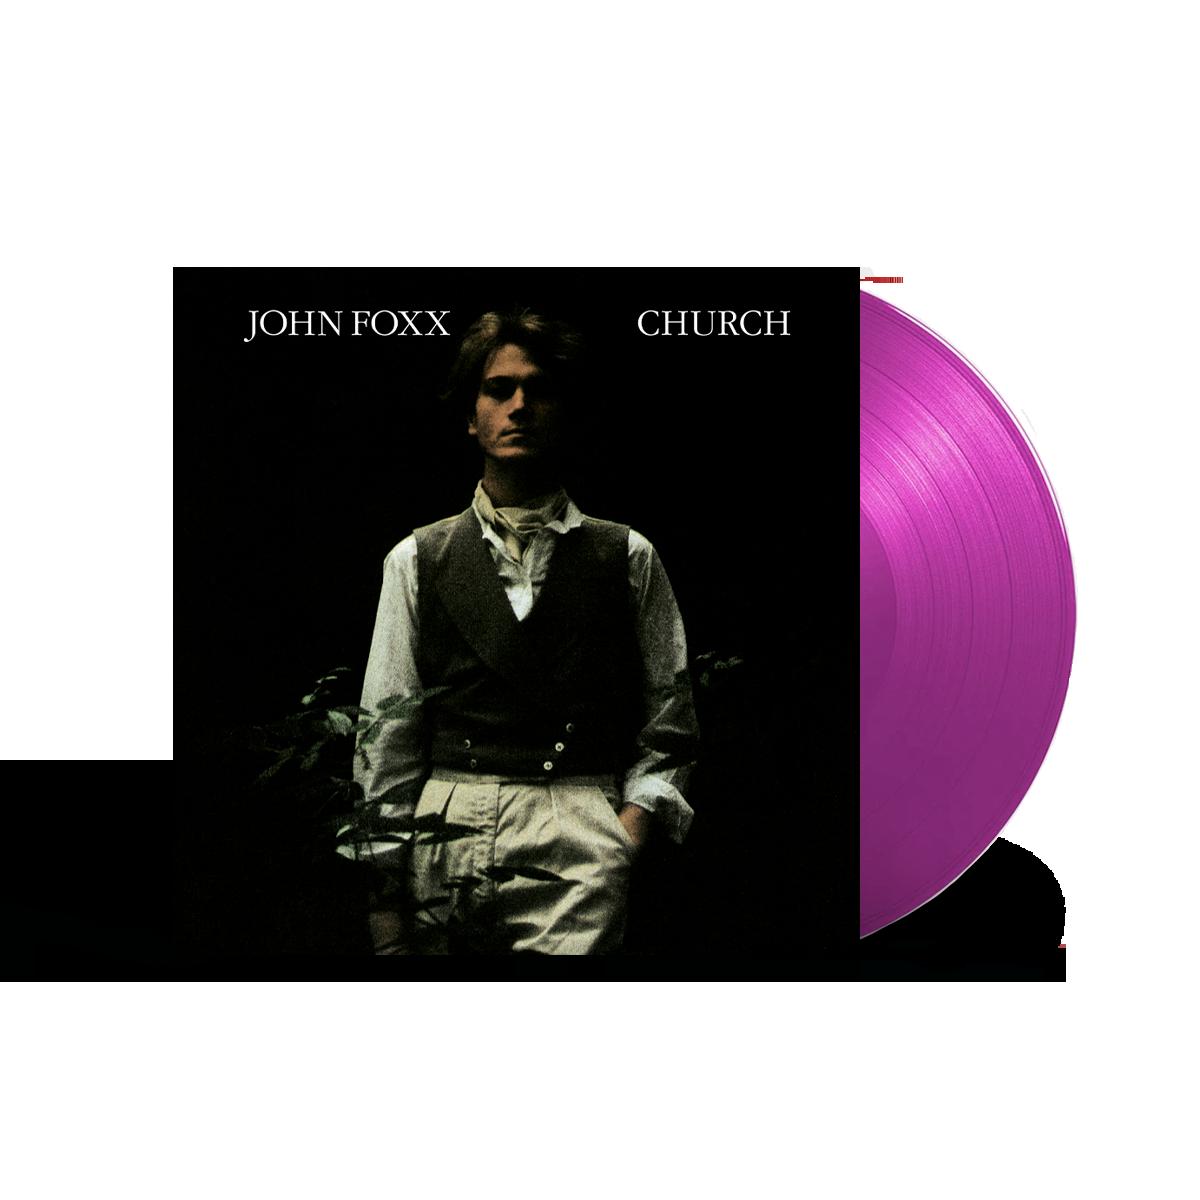 Buy Online John Foxx - Church Ltd Edition Neon Violet Vinyl